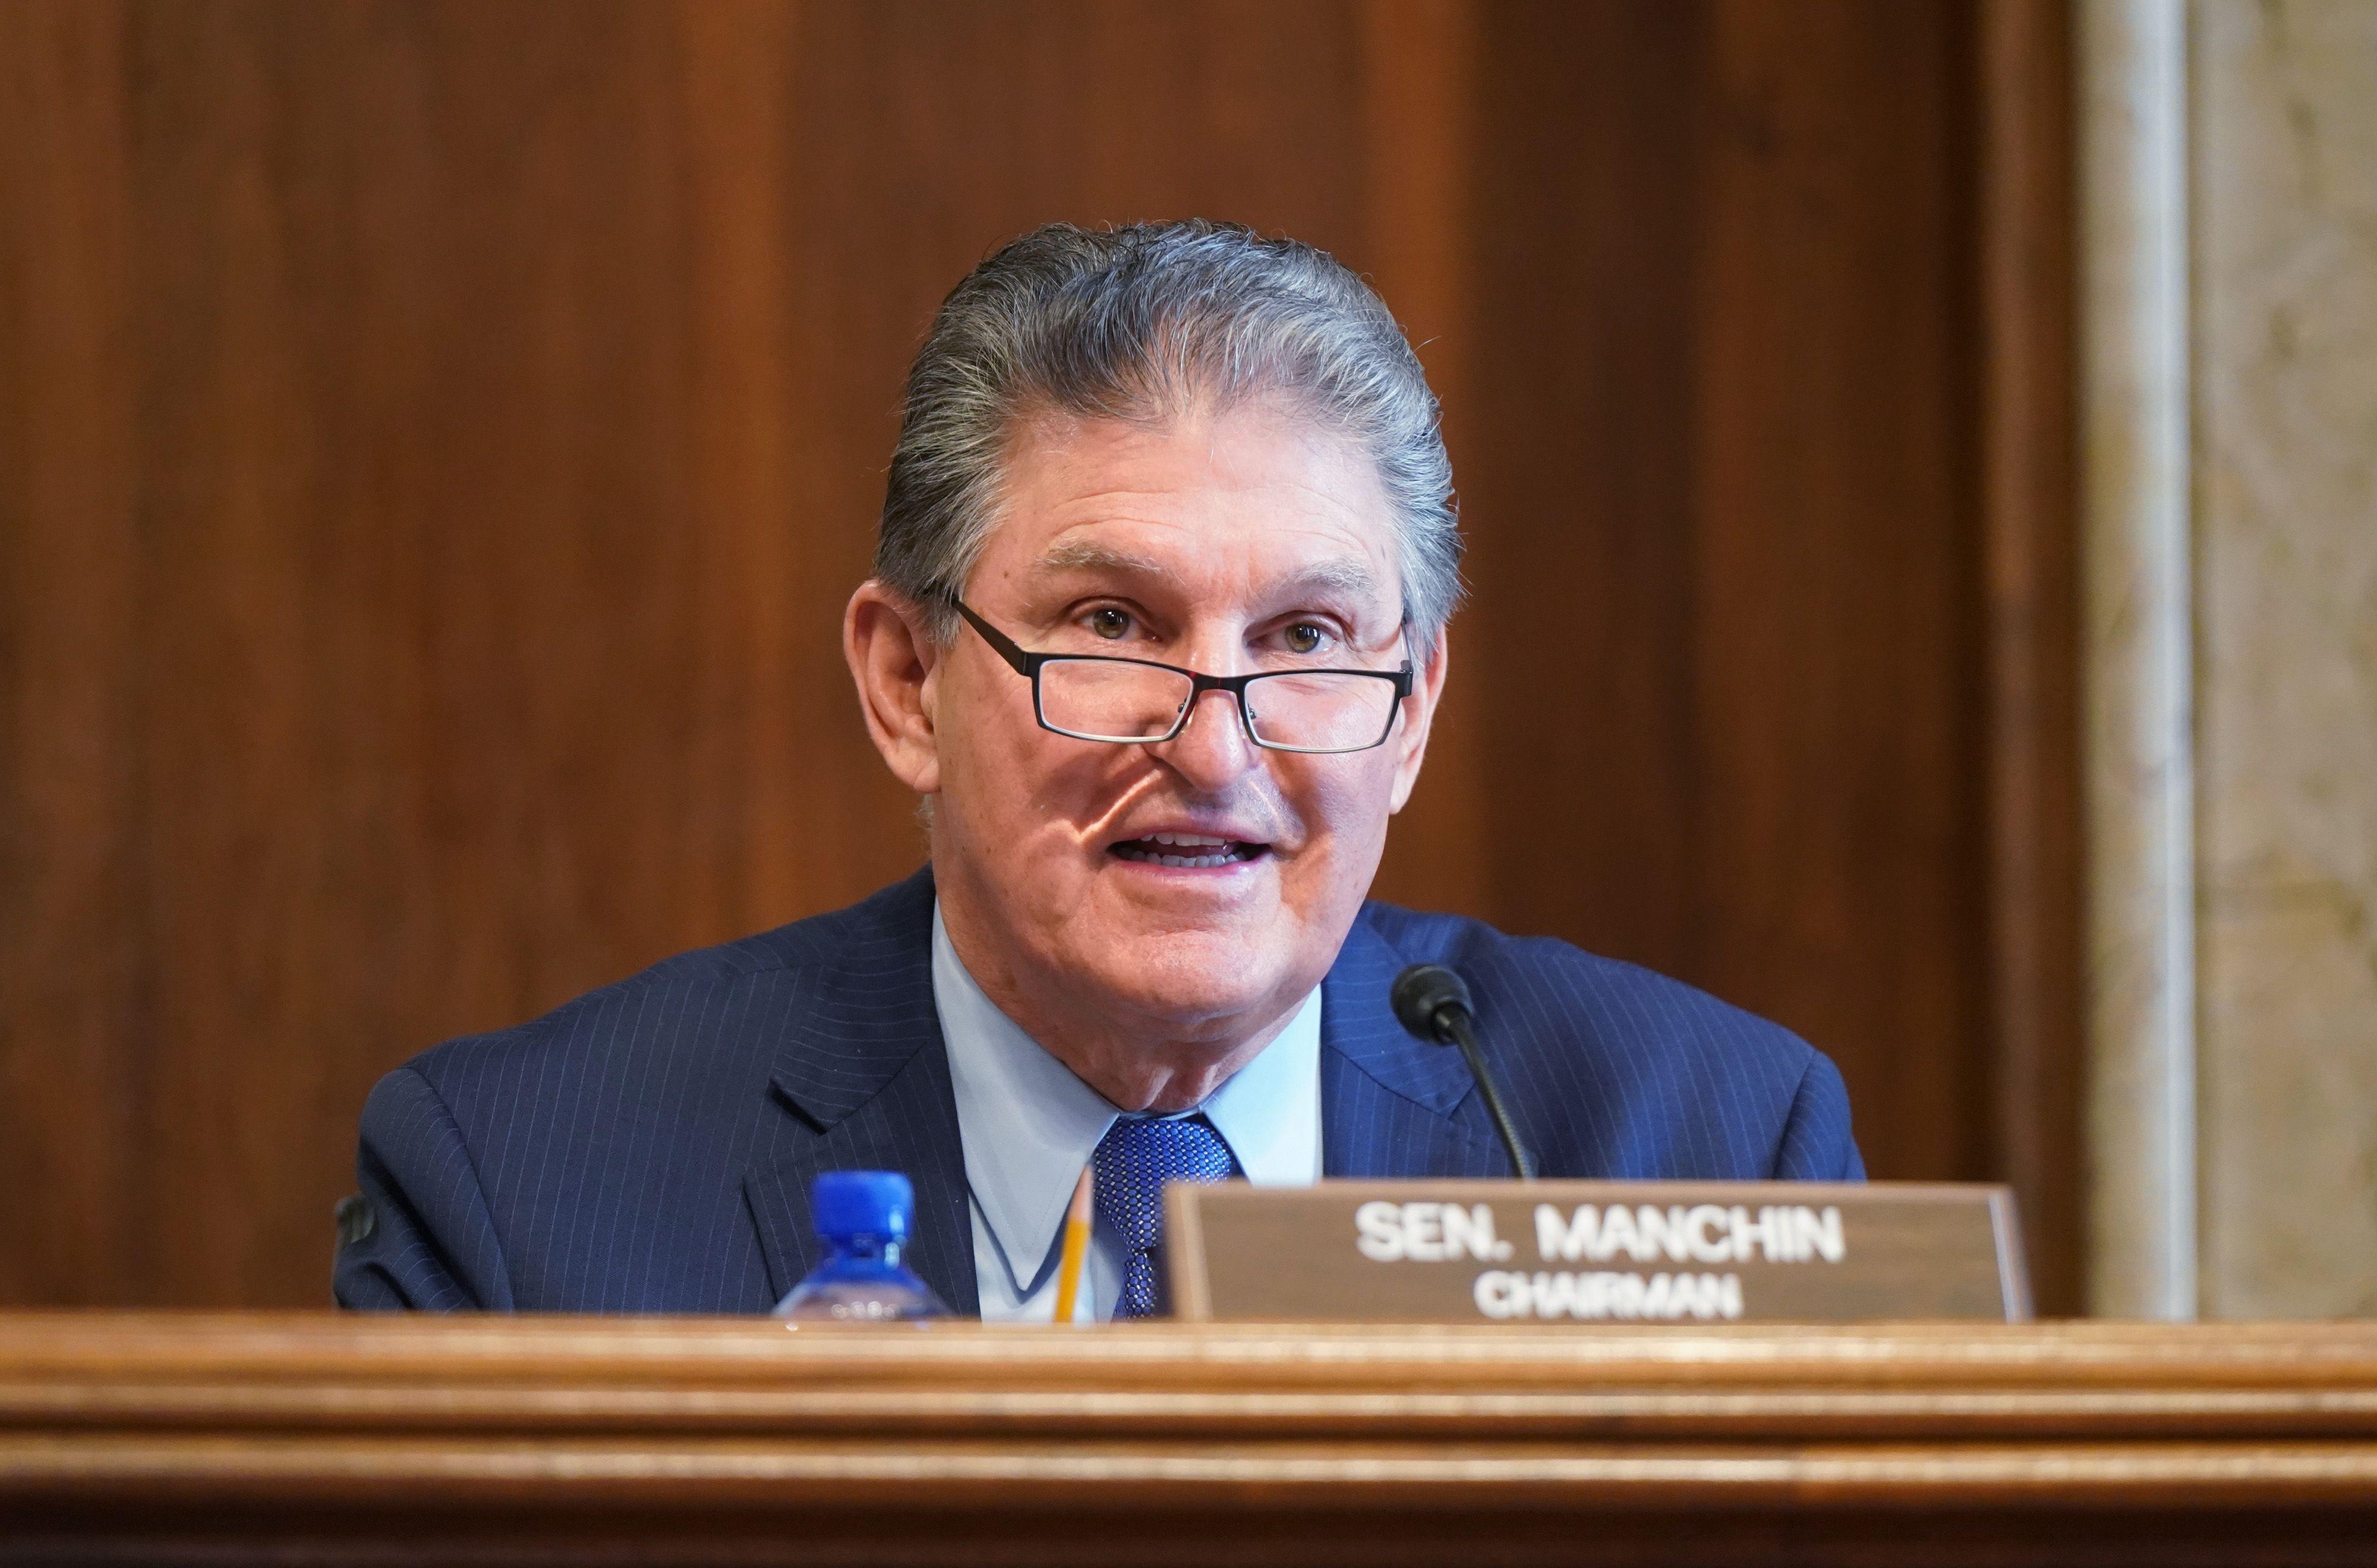 Joe Manchin speaks before the U.S. Senate.